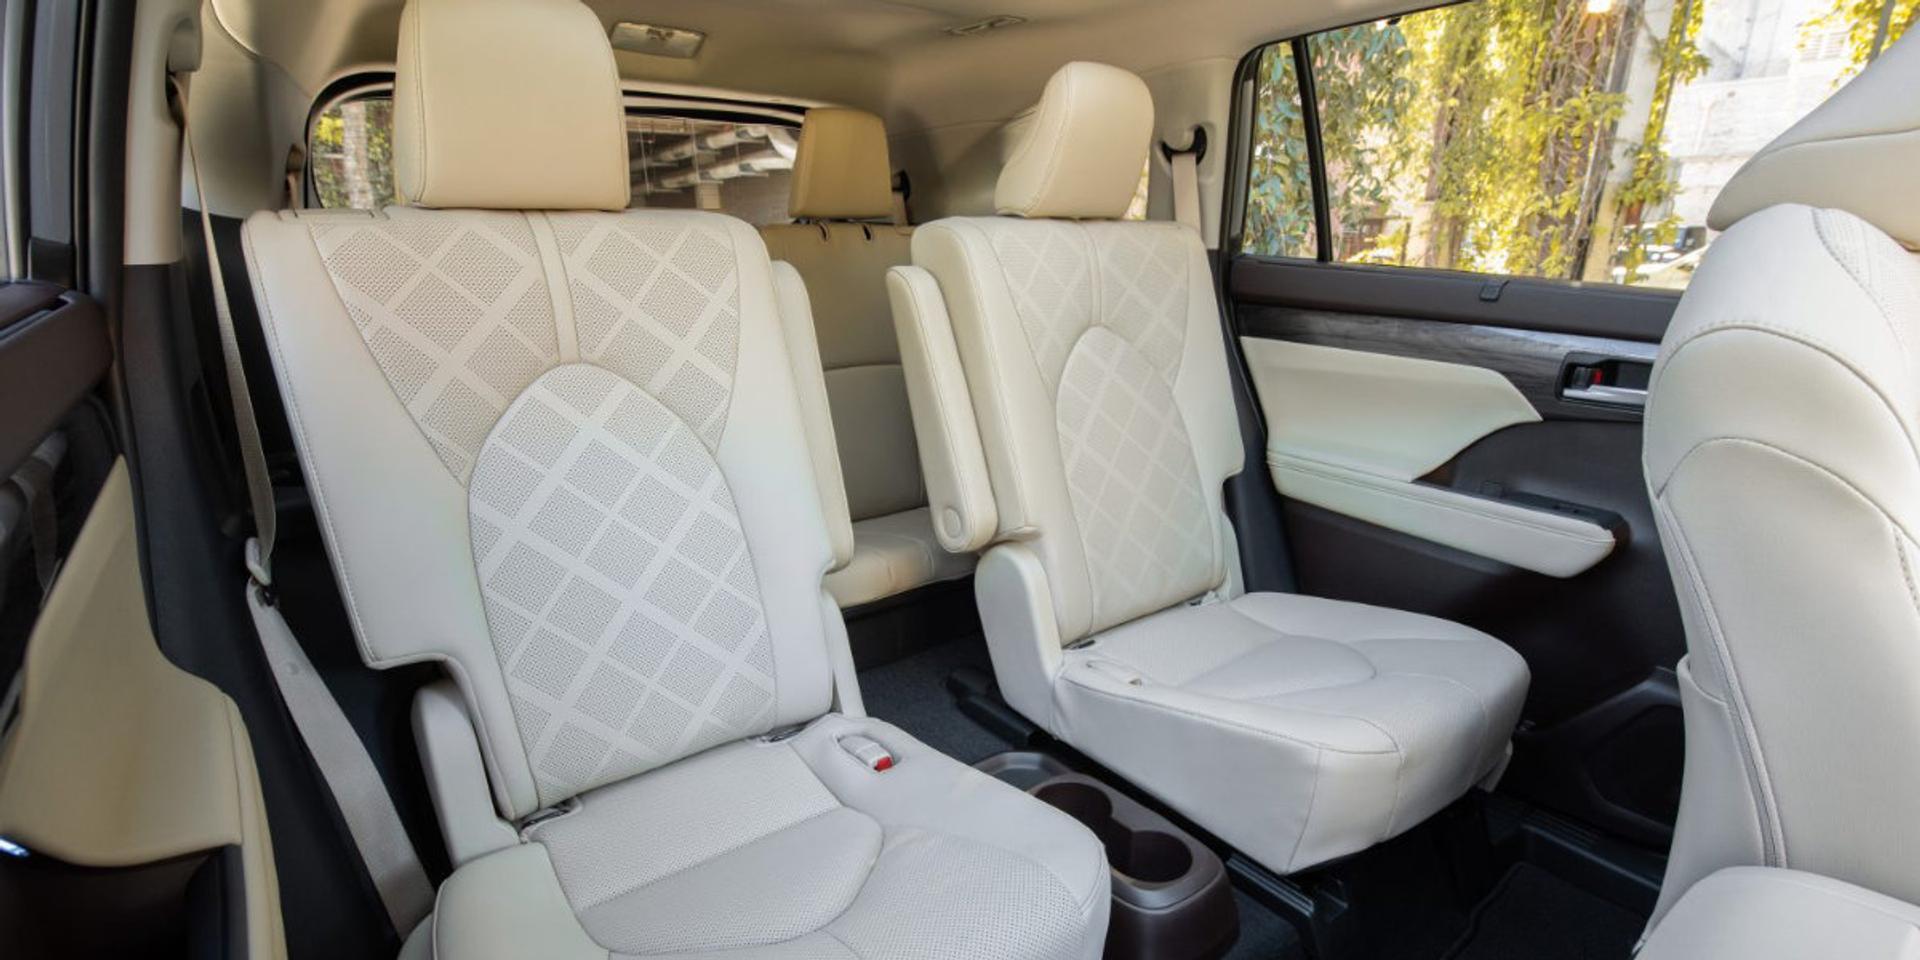 Toyota Highlander back row seats